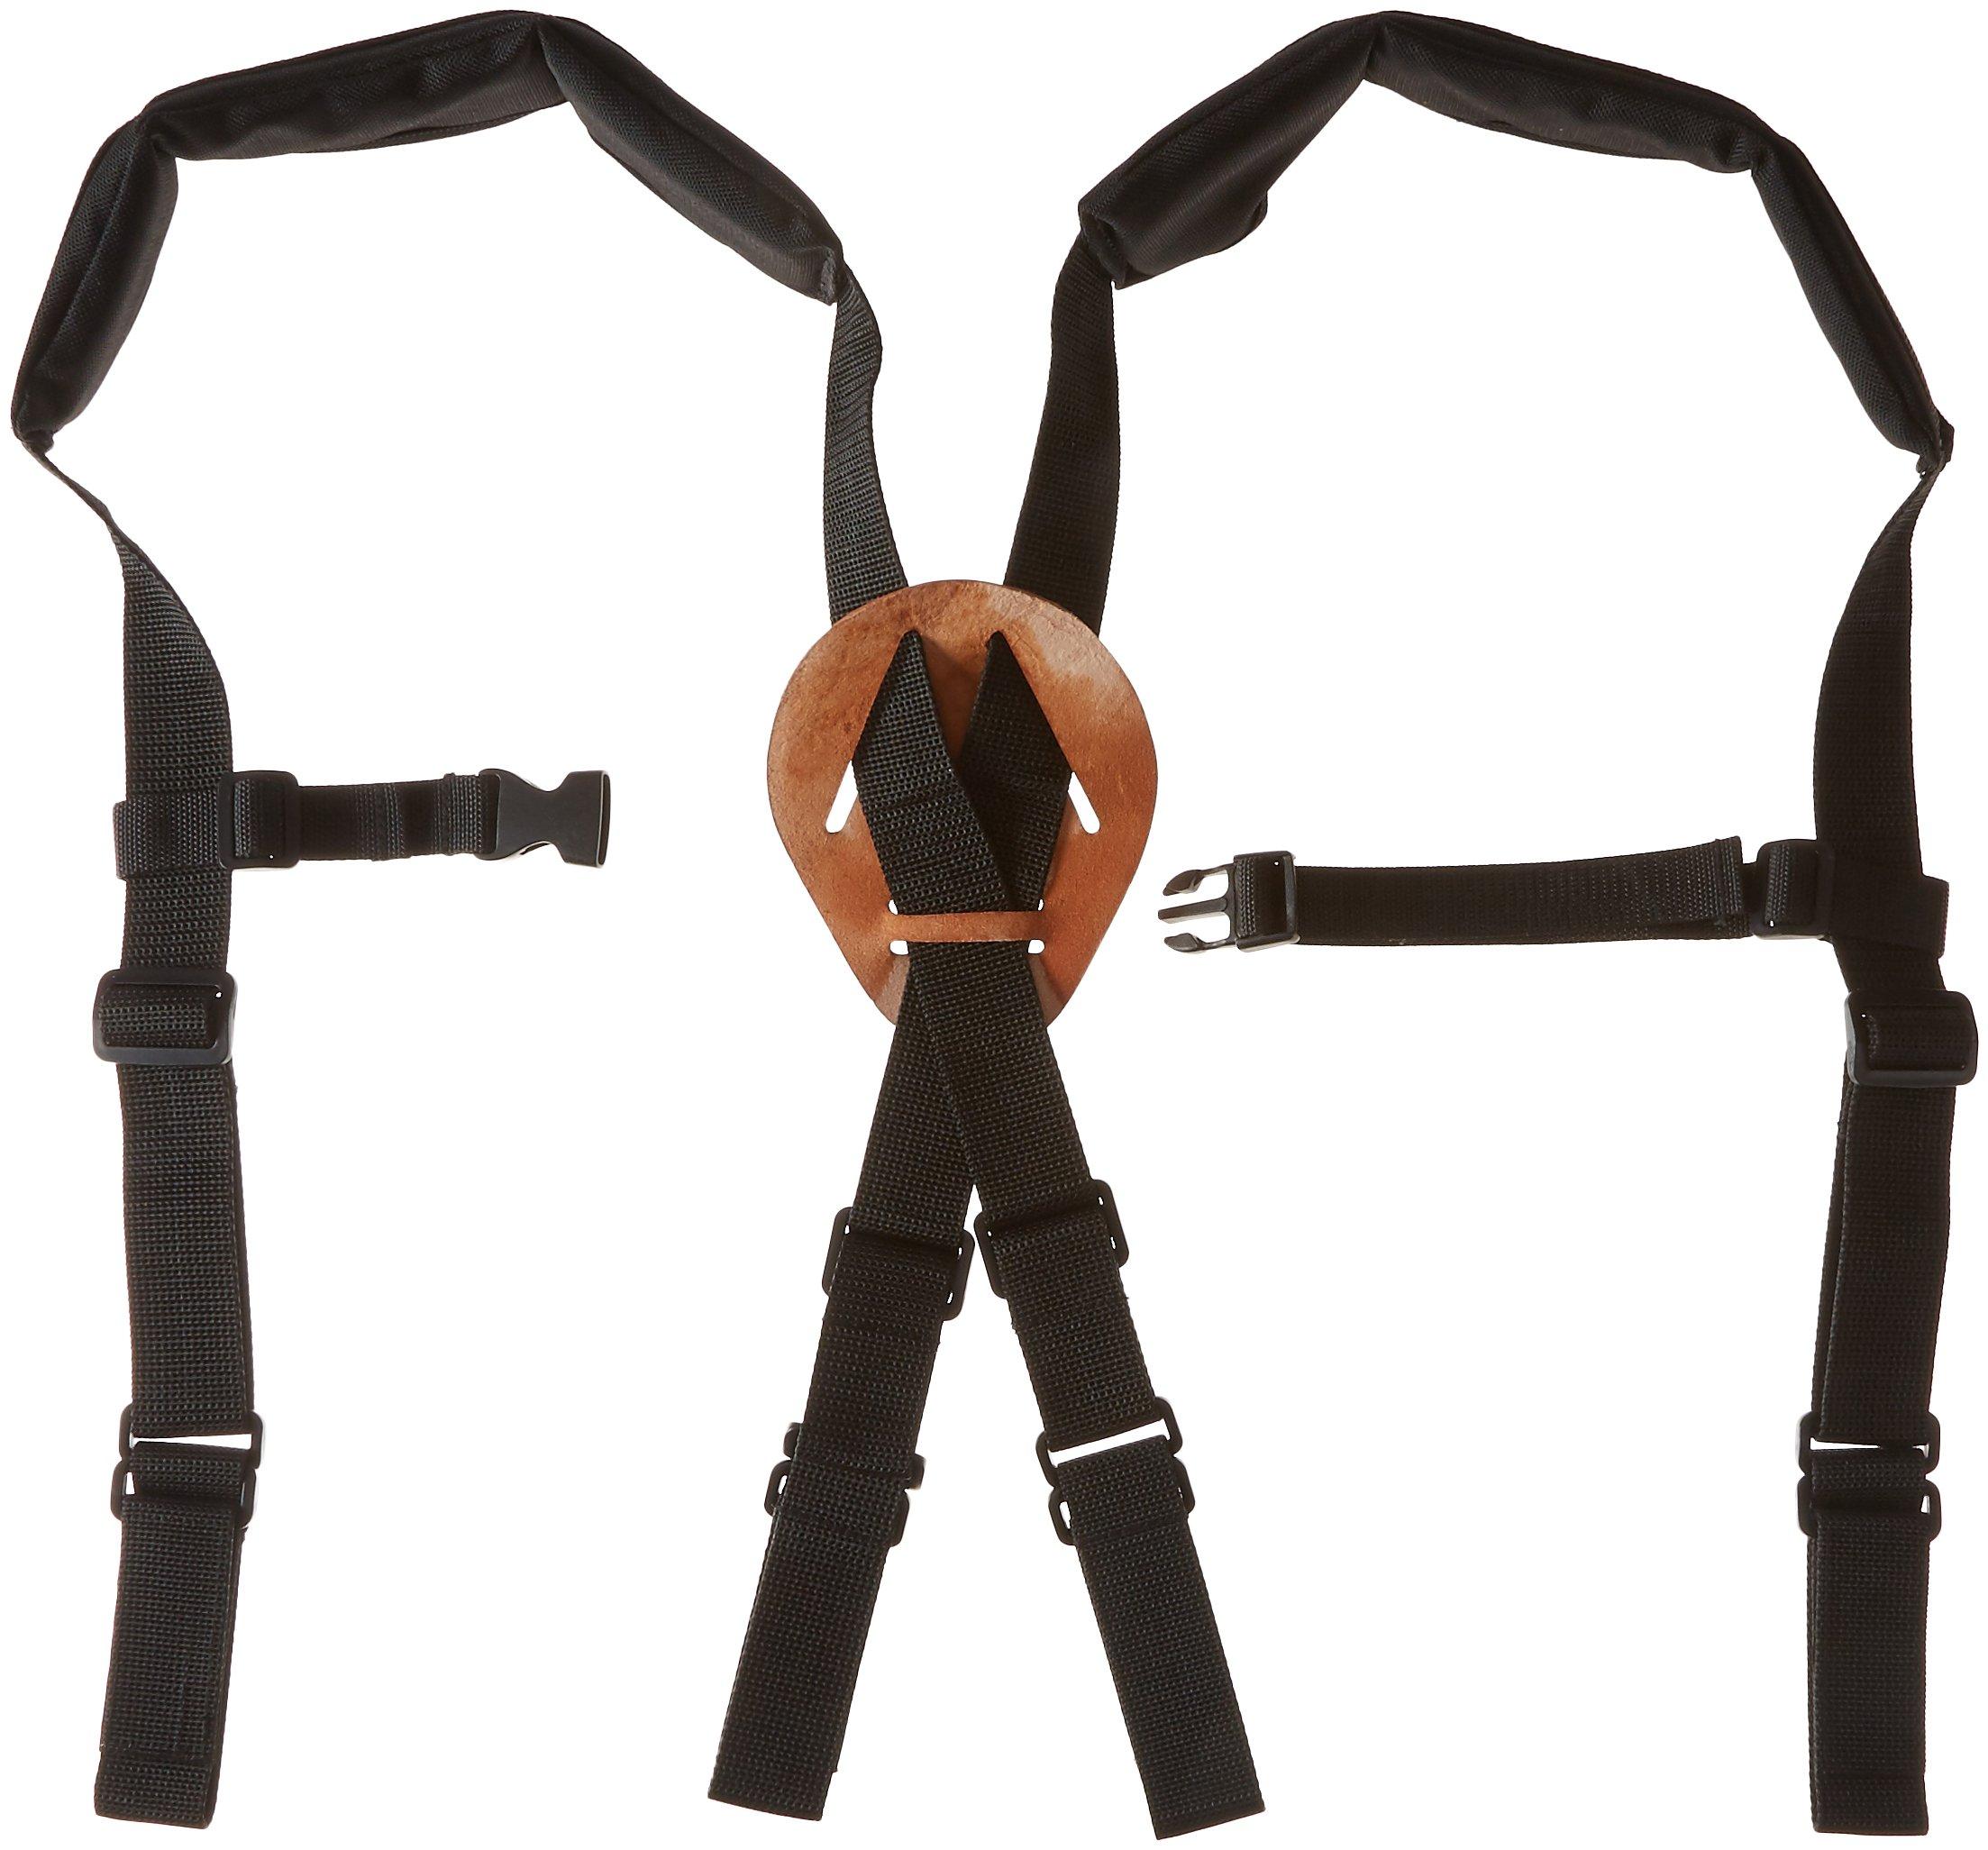 CLC Custom Leathercraft 5122 Padded Construction Suspenders